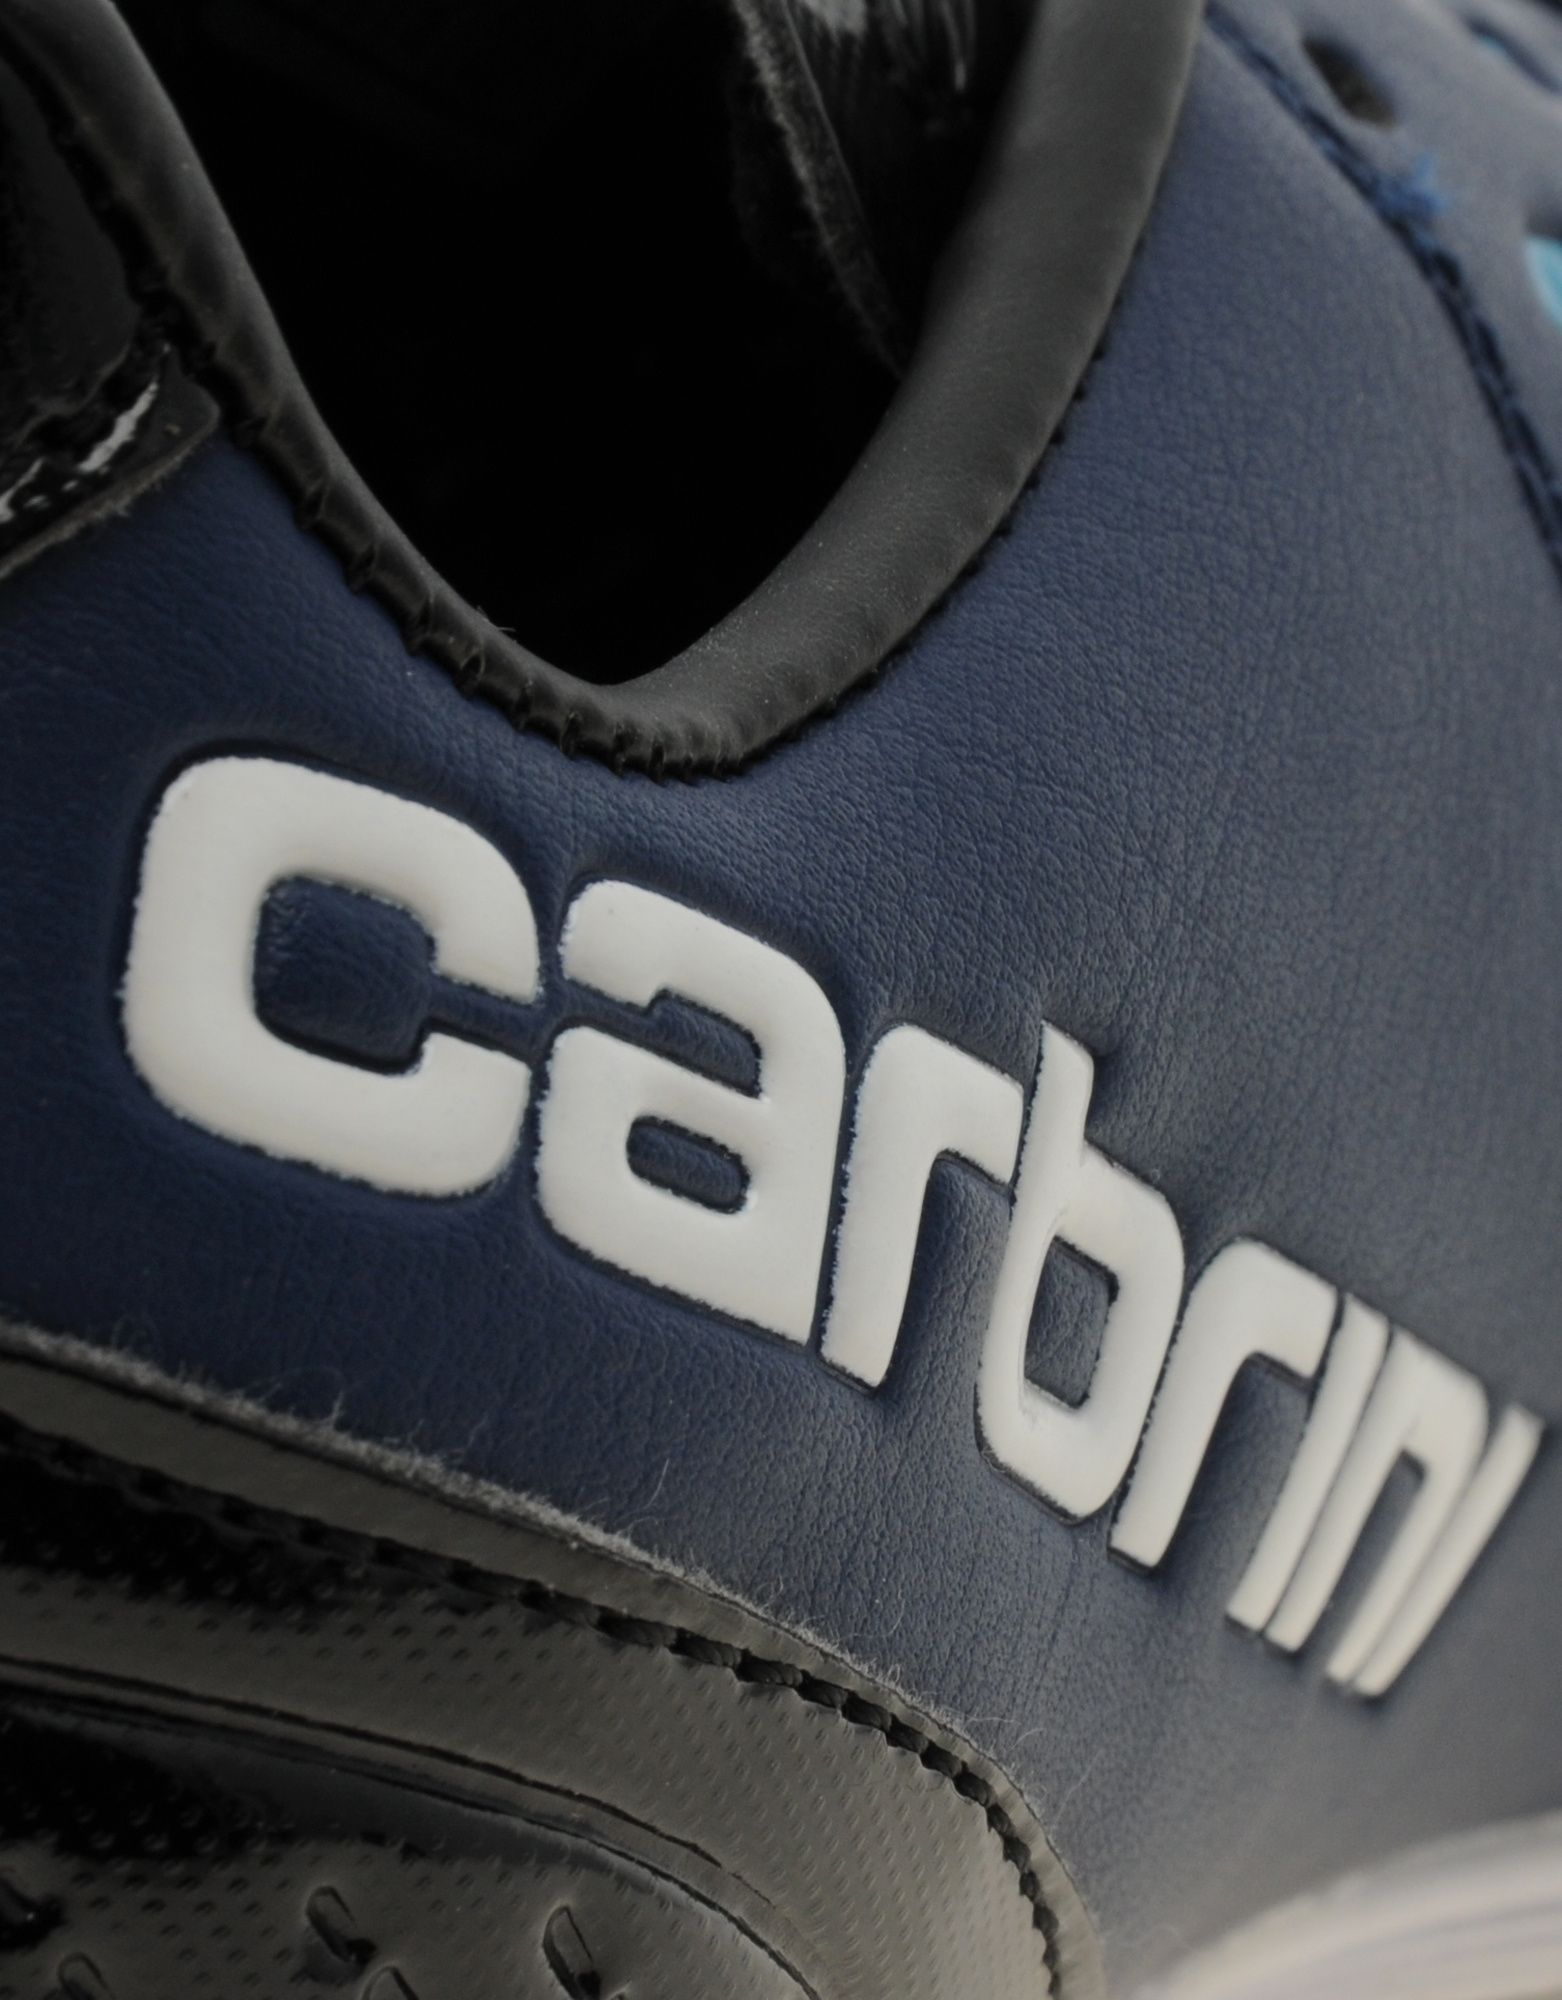 Carbrini Coppa Astro Turf Childrens